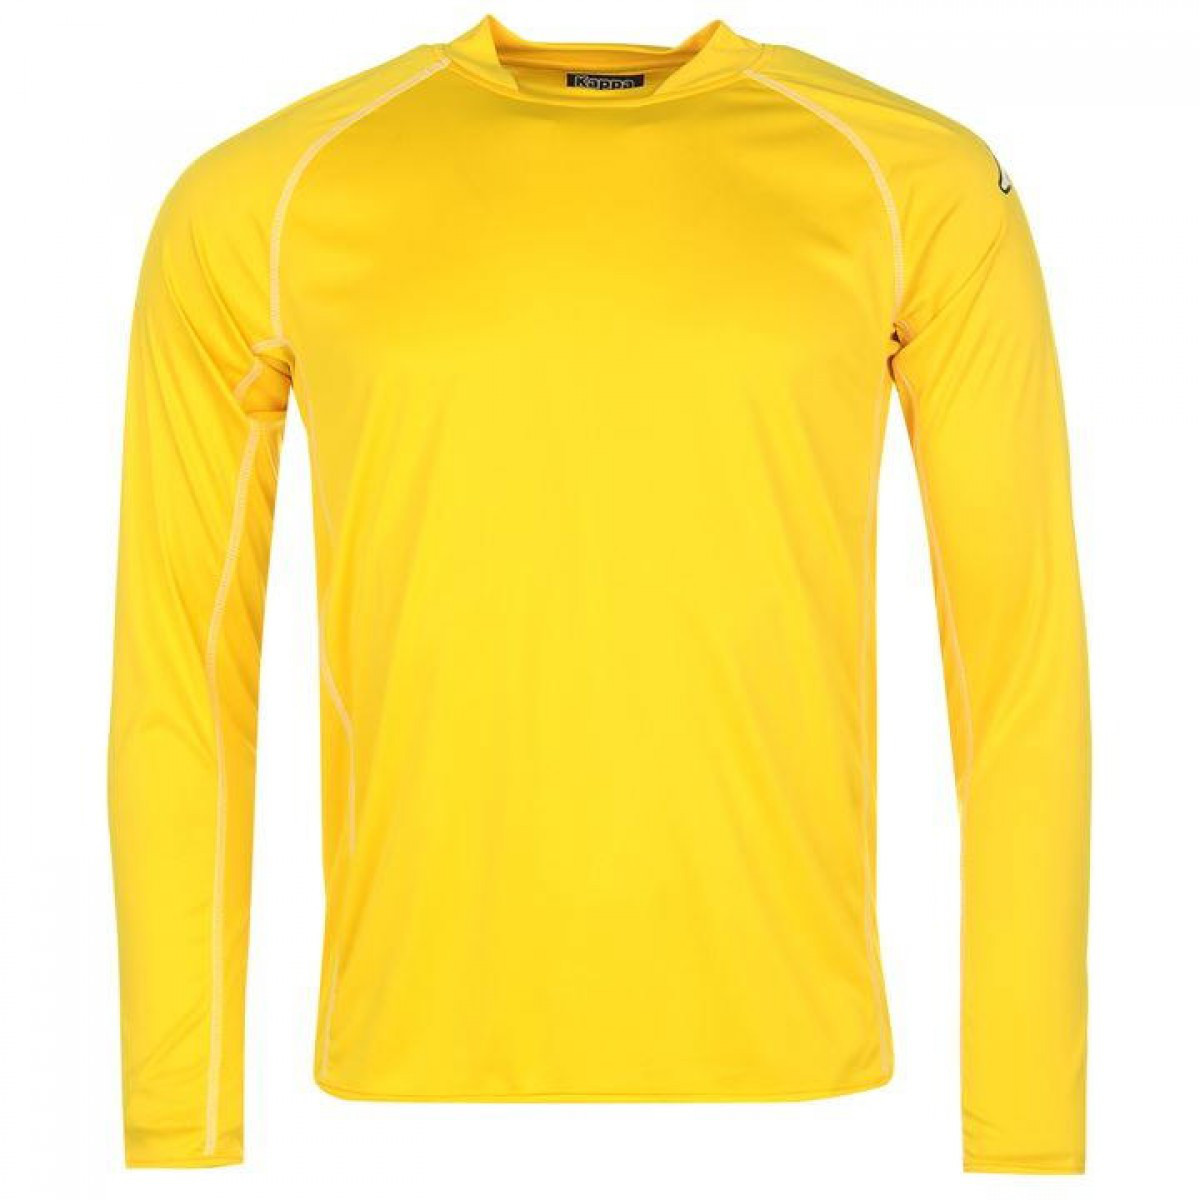 cdcb0eb9e4d6 Футболка Kappa Masa Long Sleeve Football Yellow - Оригинал — в ...